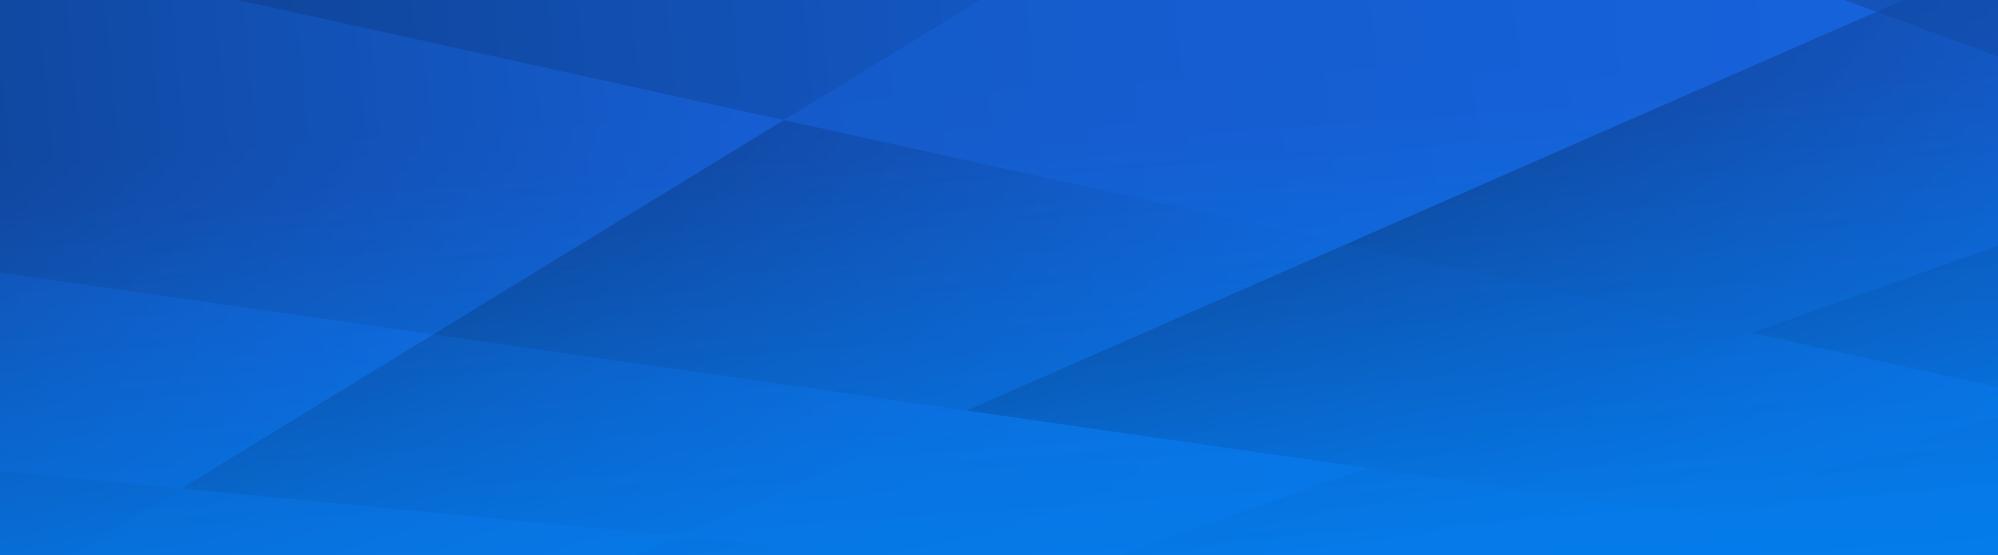 blue-background-003